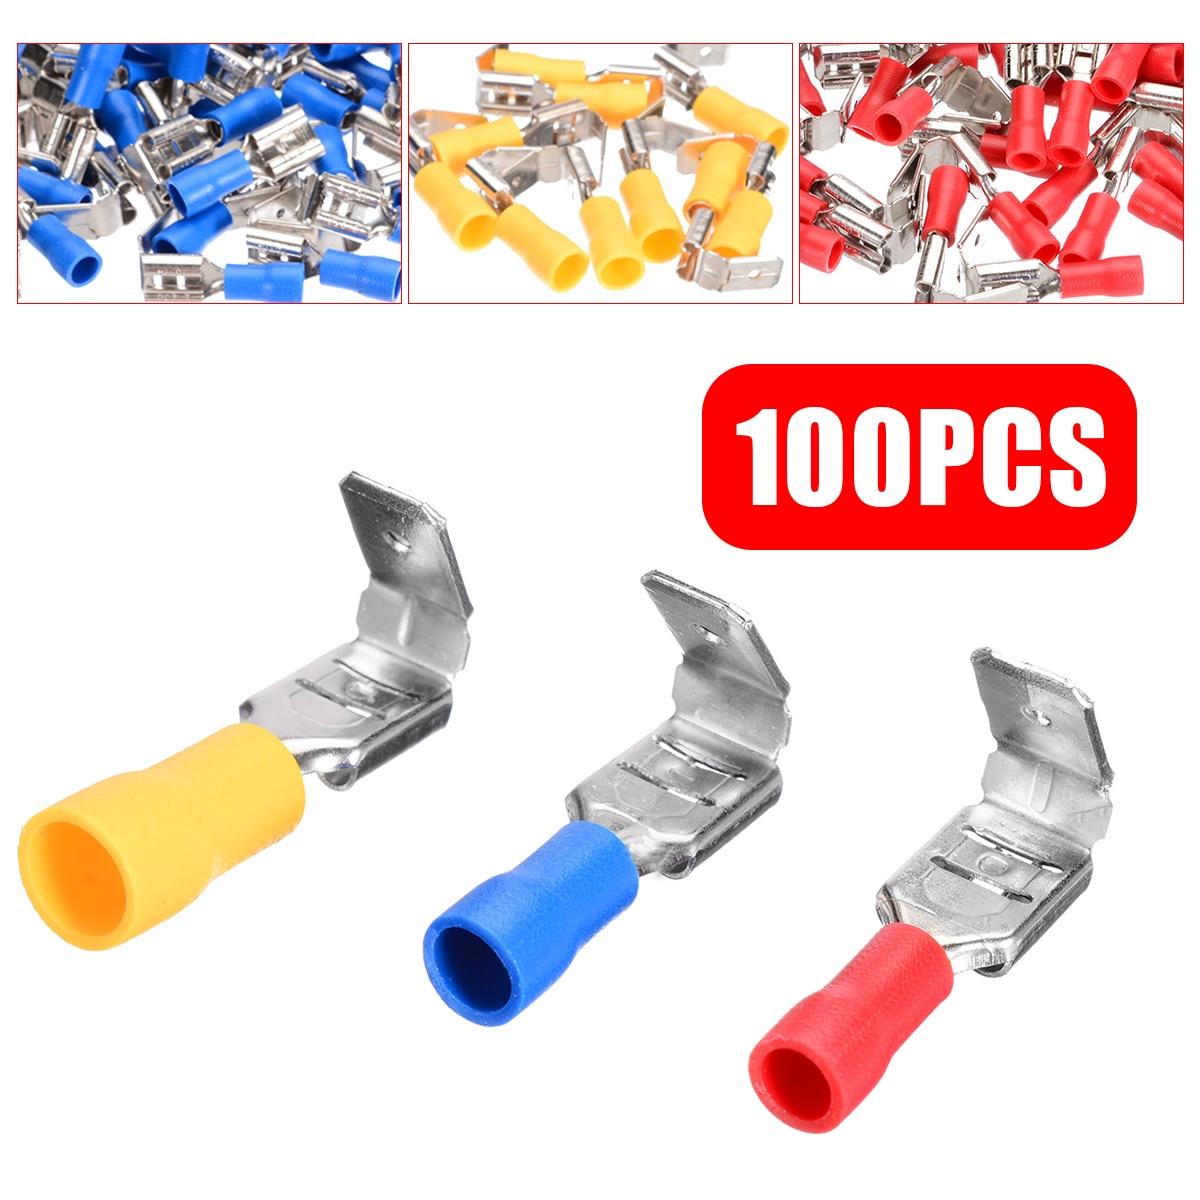 100pcs PVC Isolamento Spade Sobreposto Crimp Terminal Macho Fêmea 10-22AWG Conectores Isolados Sortidas Kit